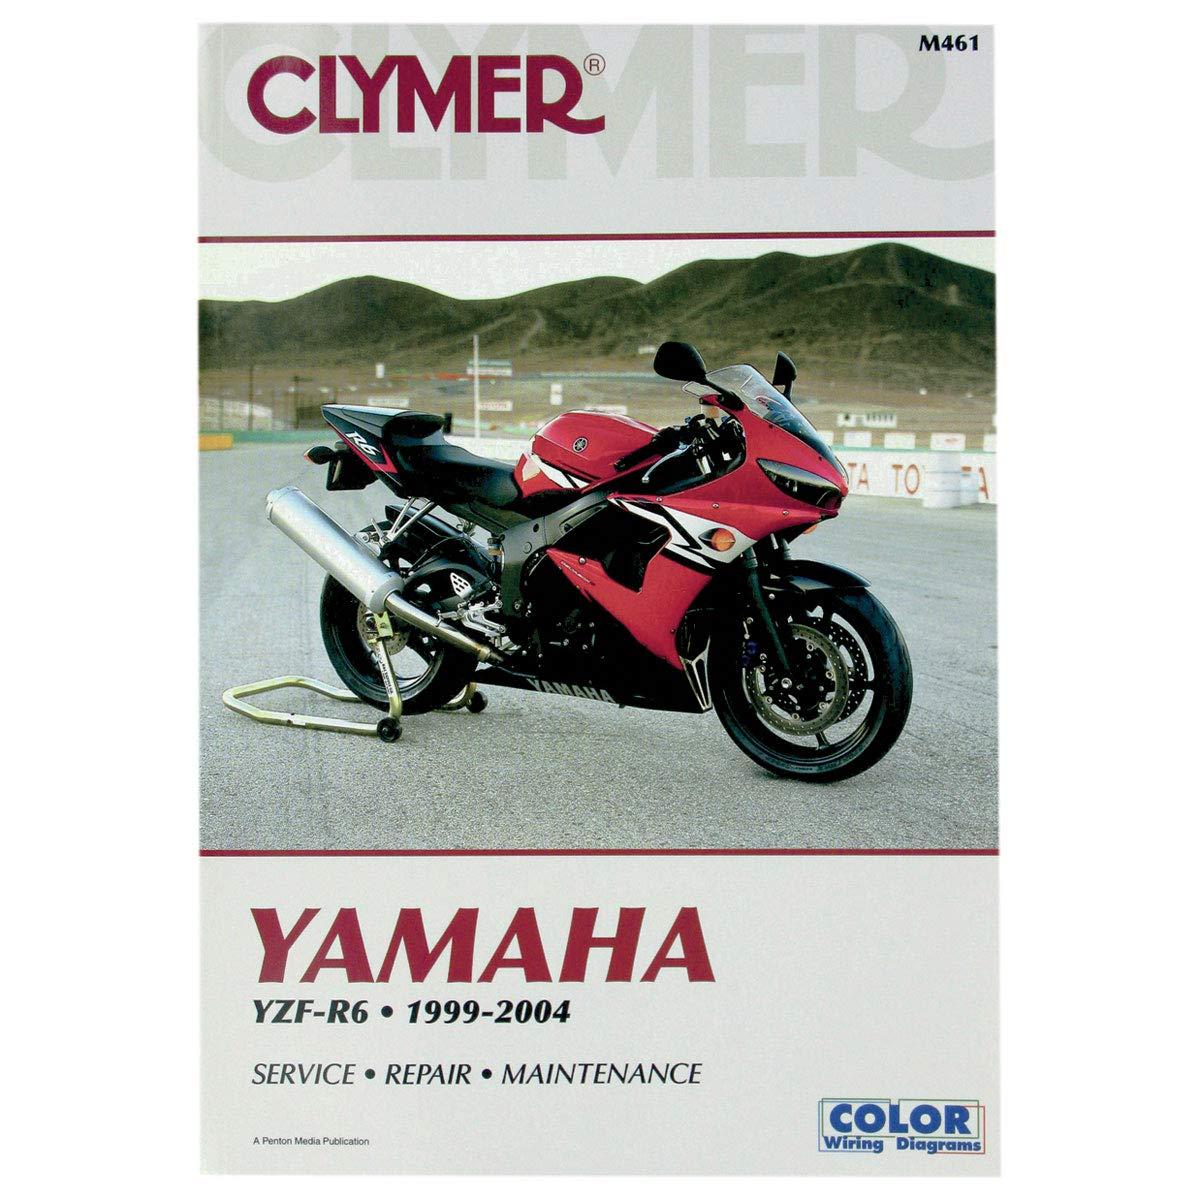 Clymer 99-04 Yamaha YZF-R6 Service Manual on